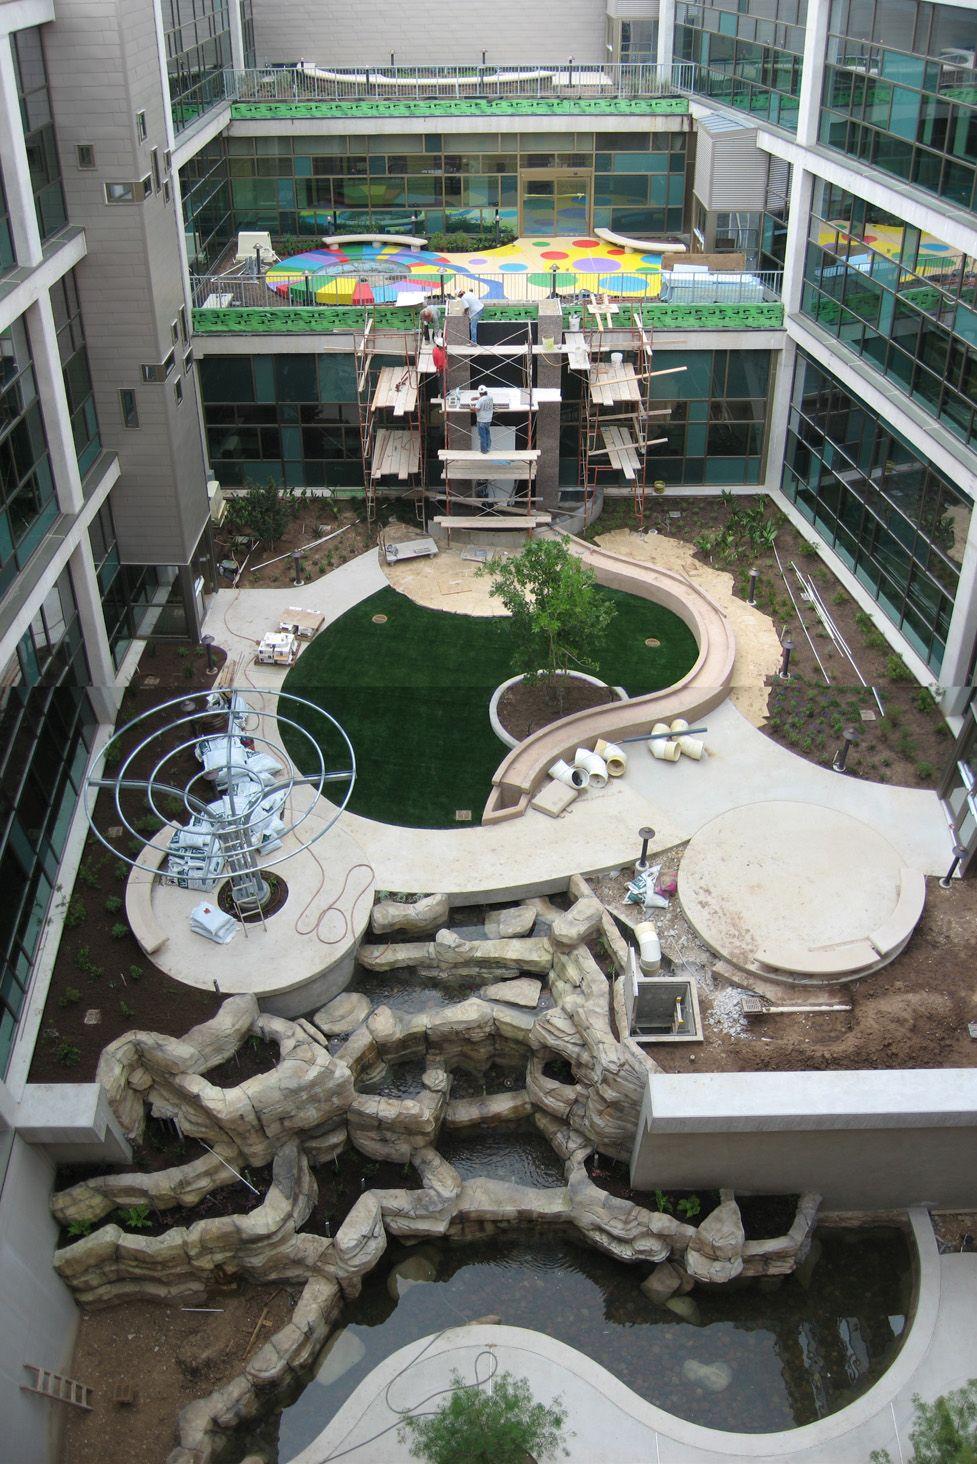 Visitors at the Dell Children's Medical Center grand